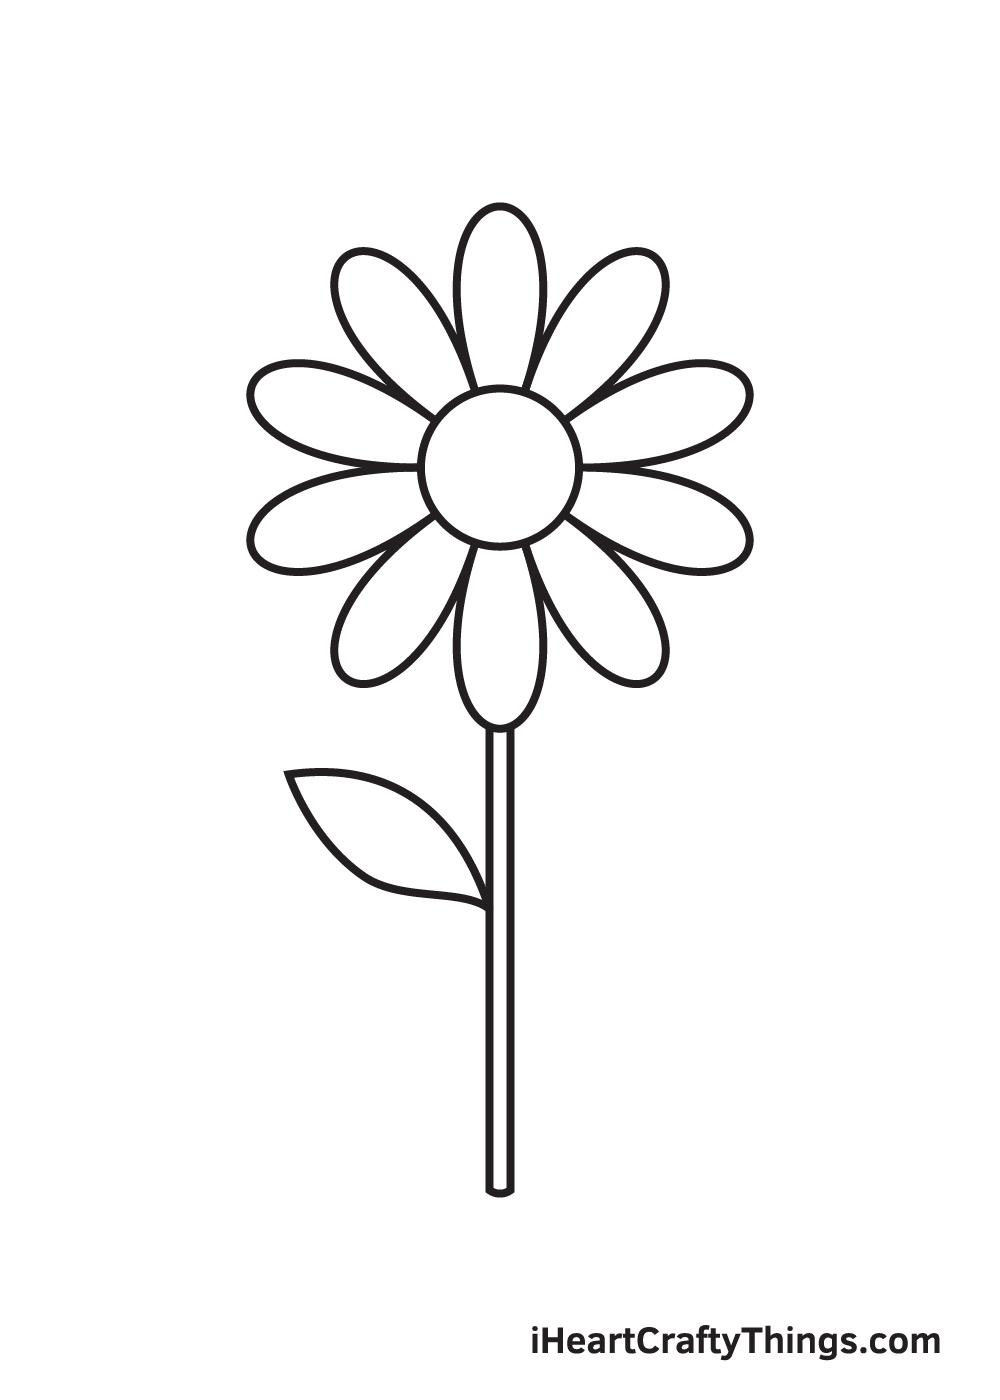 daisy drawing - step 6